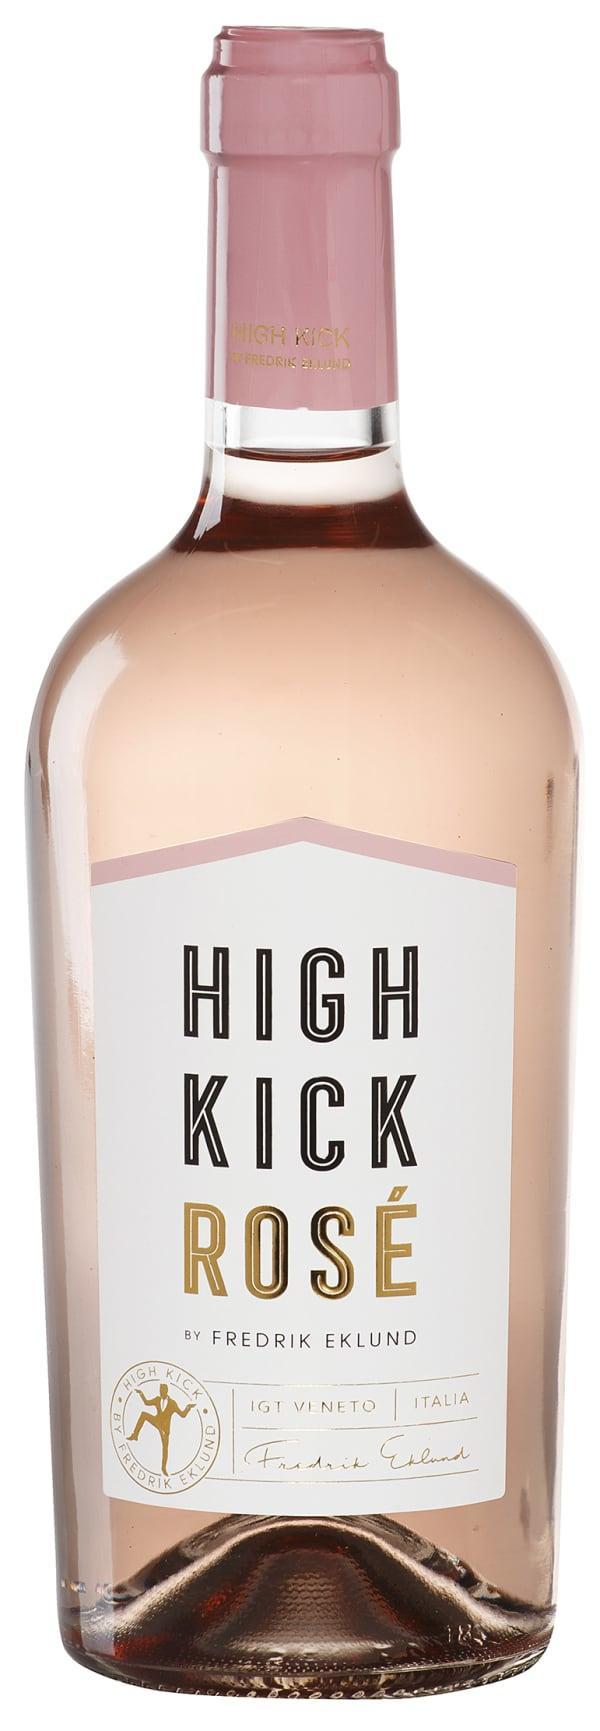 High Kick Rosé 2016